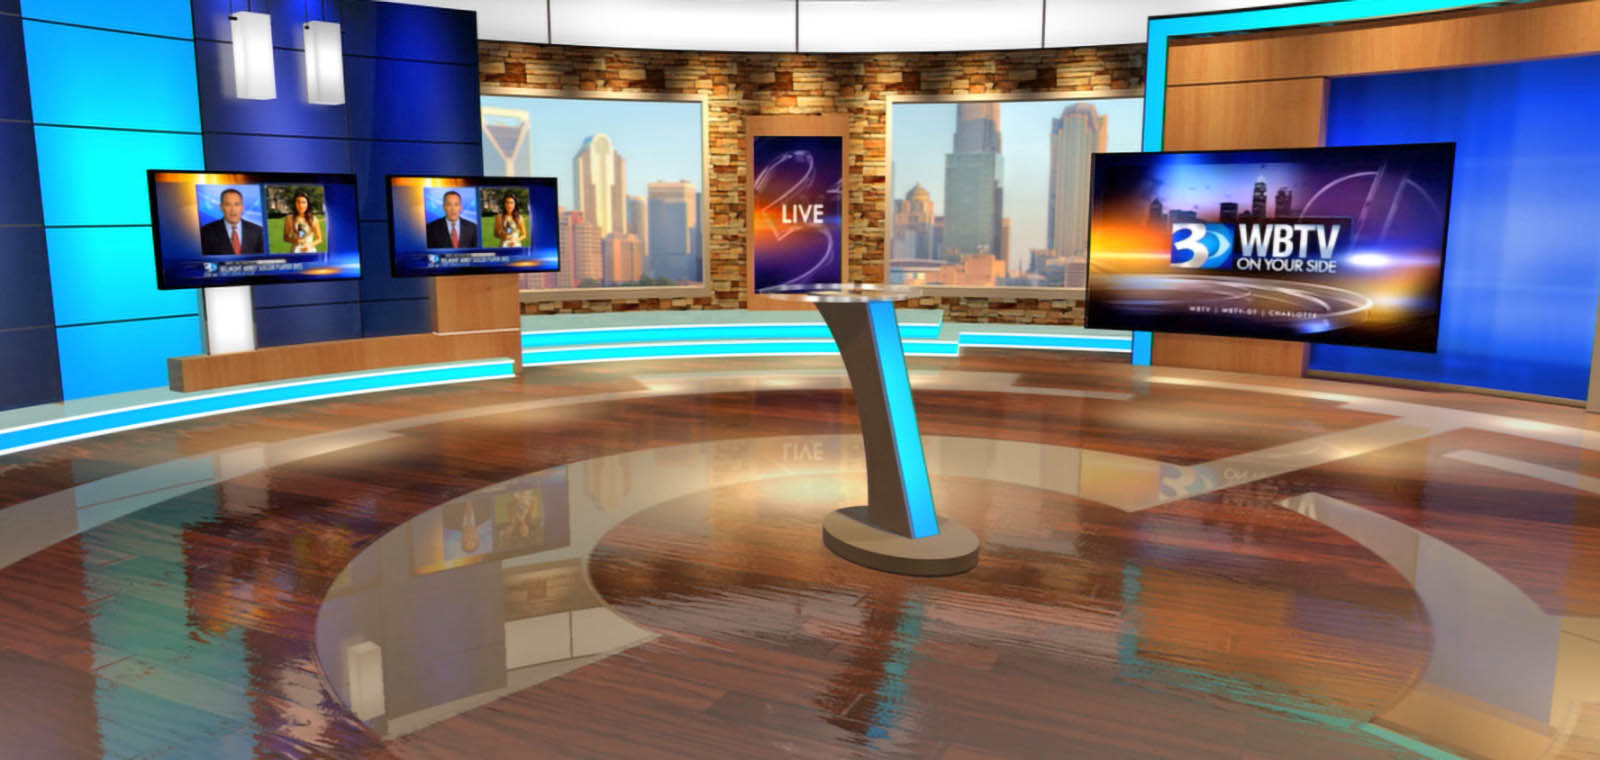 WBTV News live coverage studio